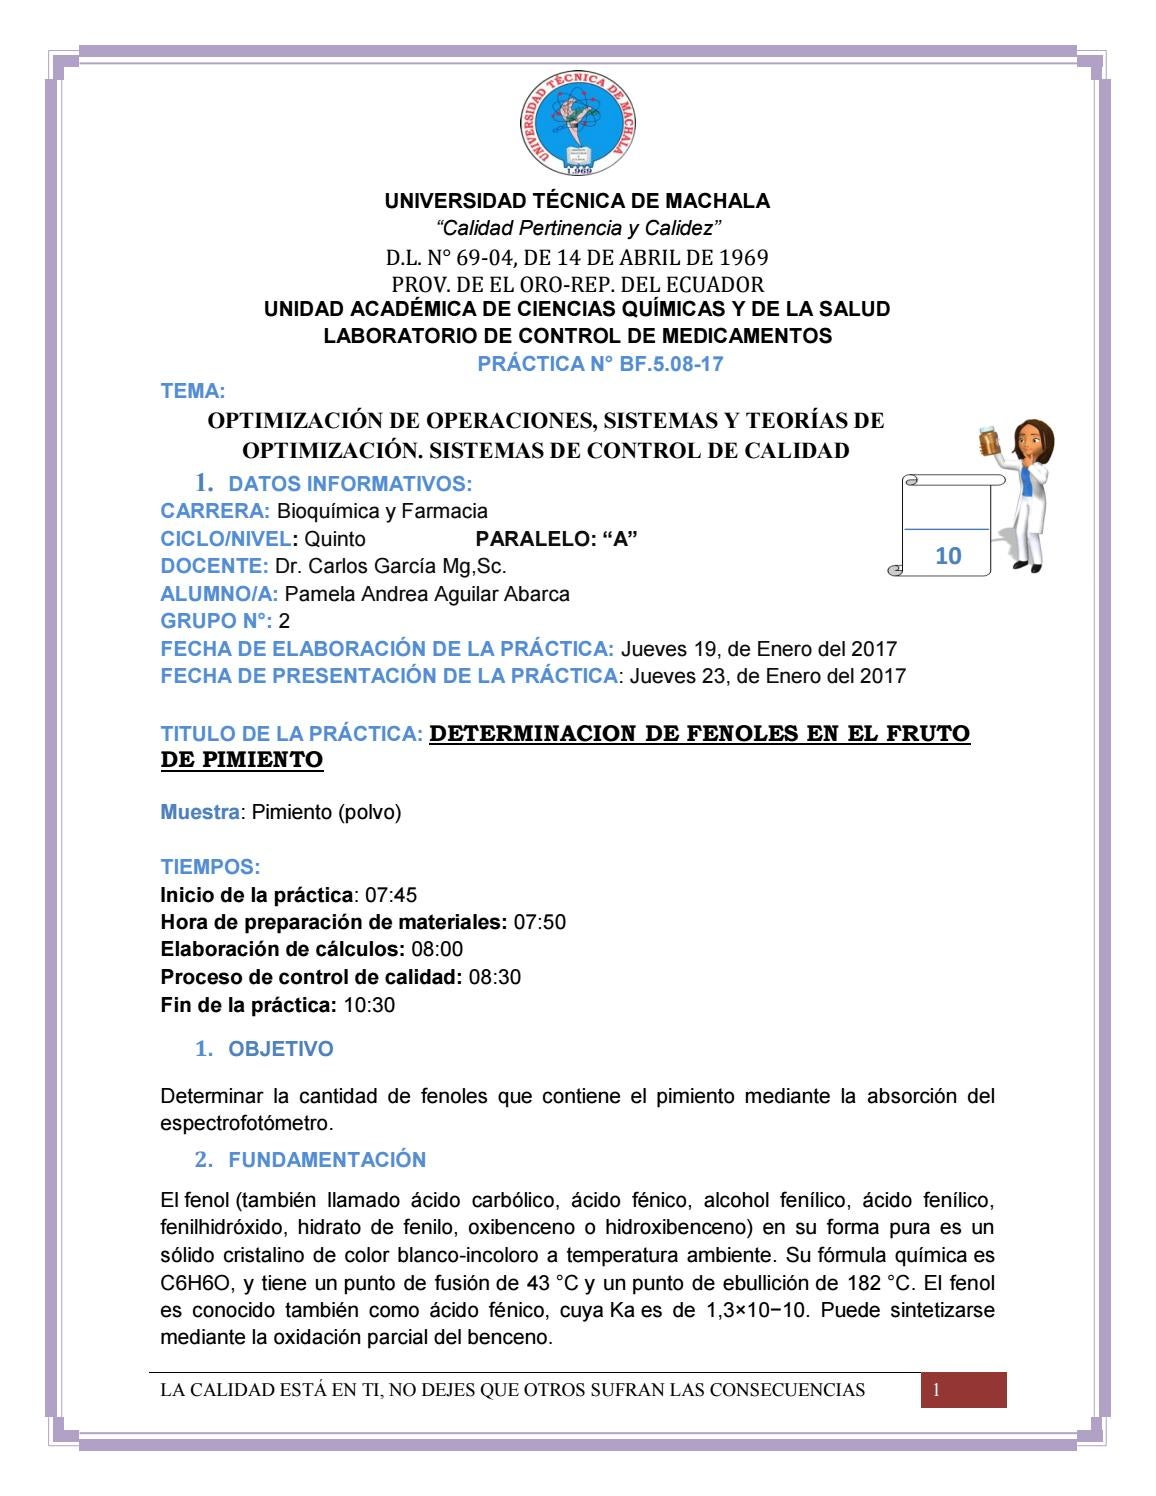 Practica 17 fenoles by Pamela Aguilar - issuu